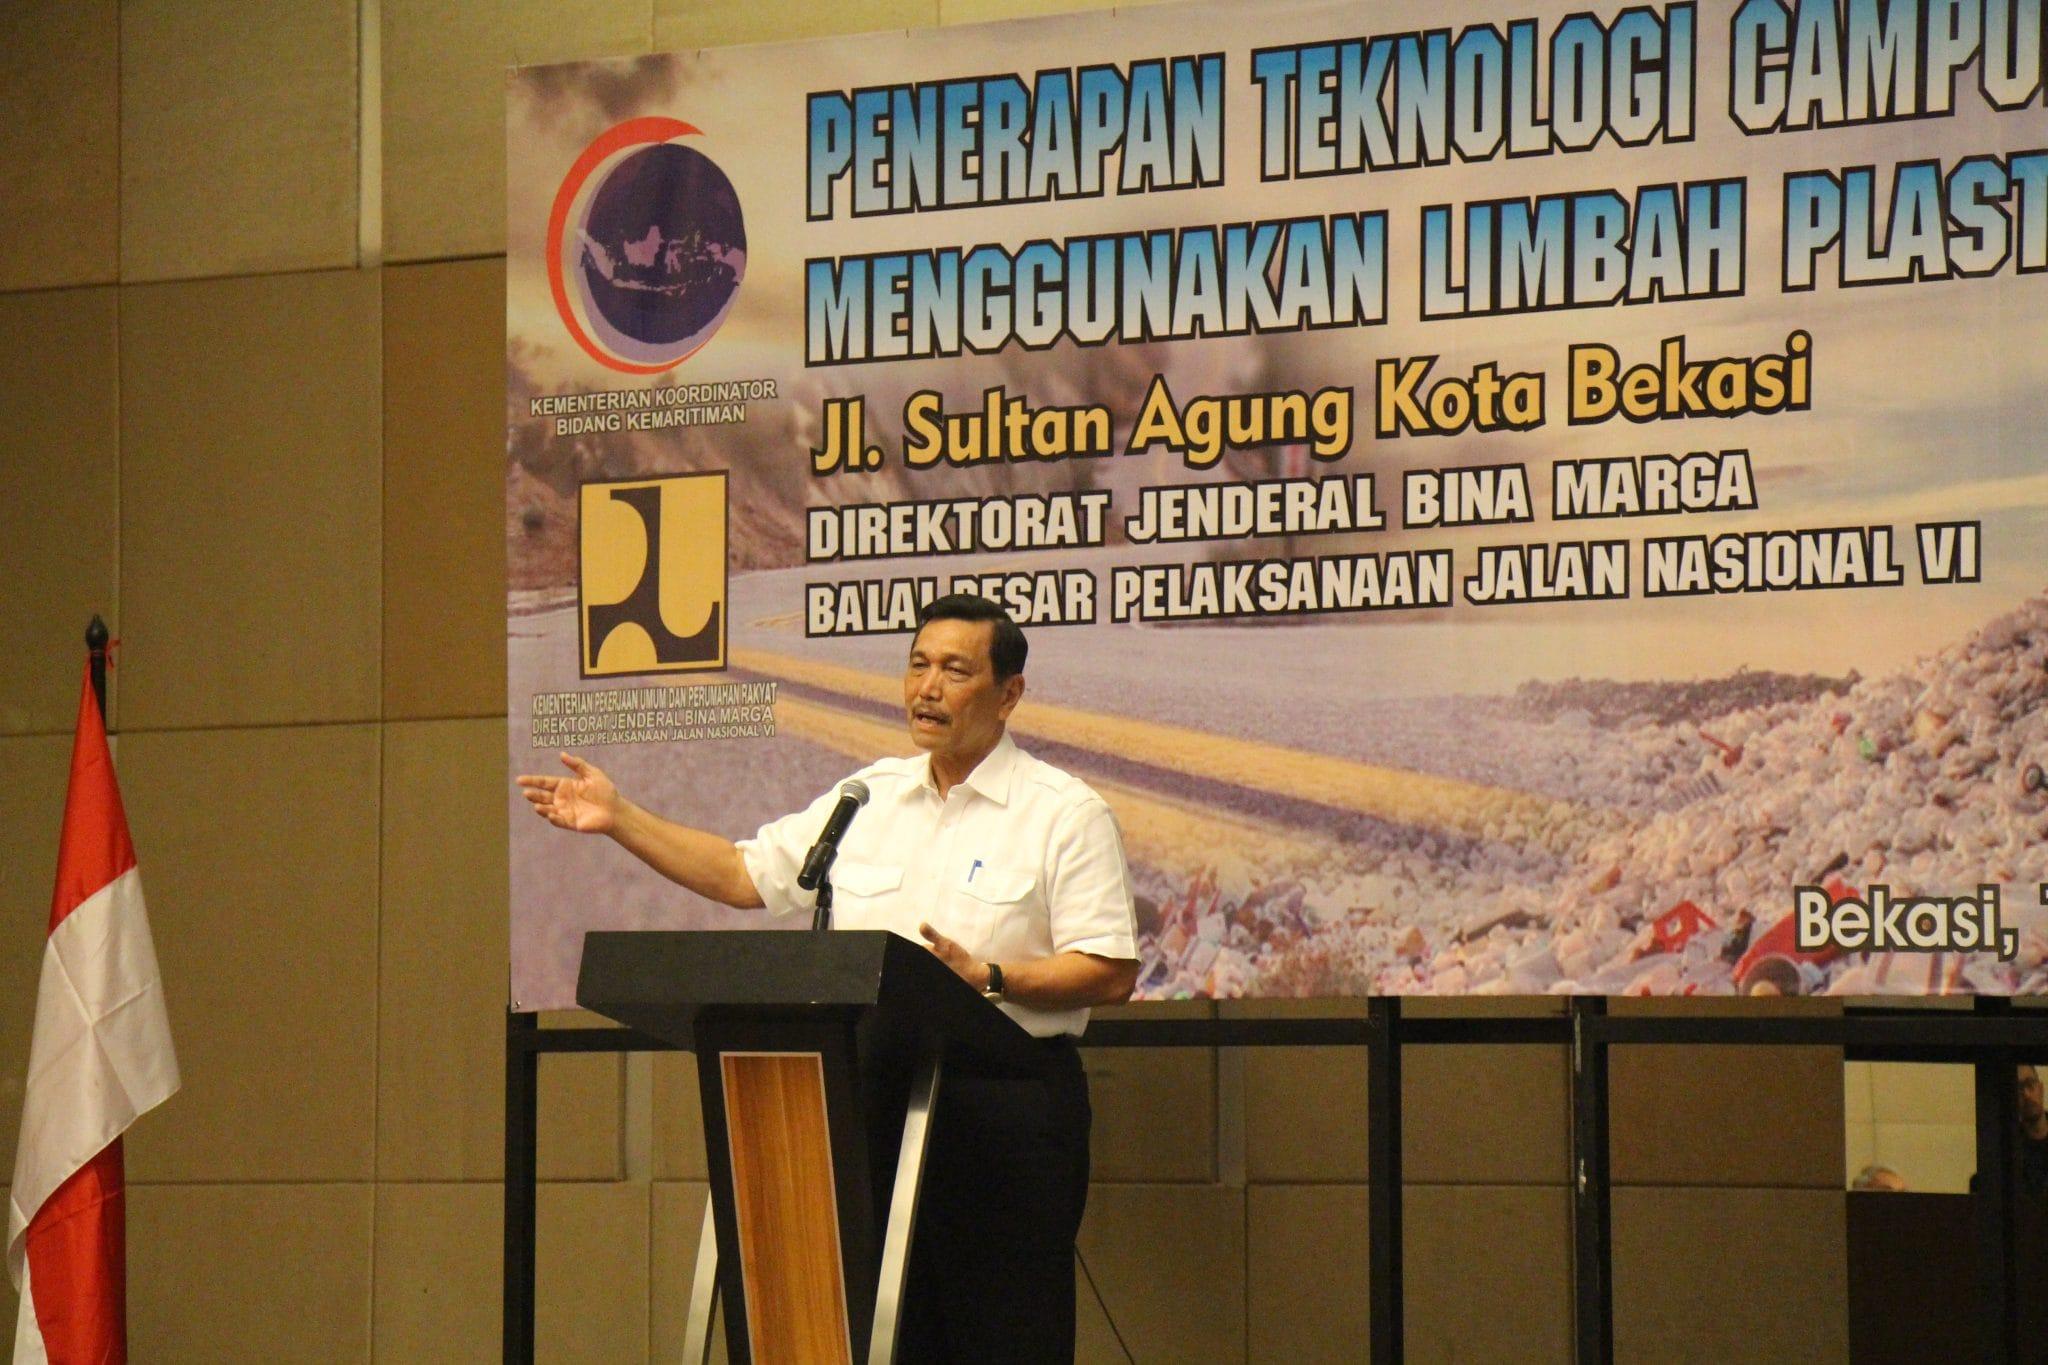 Menko Maritim Luhut B. Pandjaitan Memberikan Pidato Penerapan Teknologi Campuran Beraspal Menggunakan Limbah Plastik